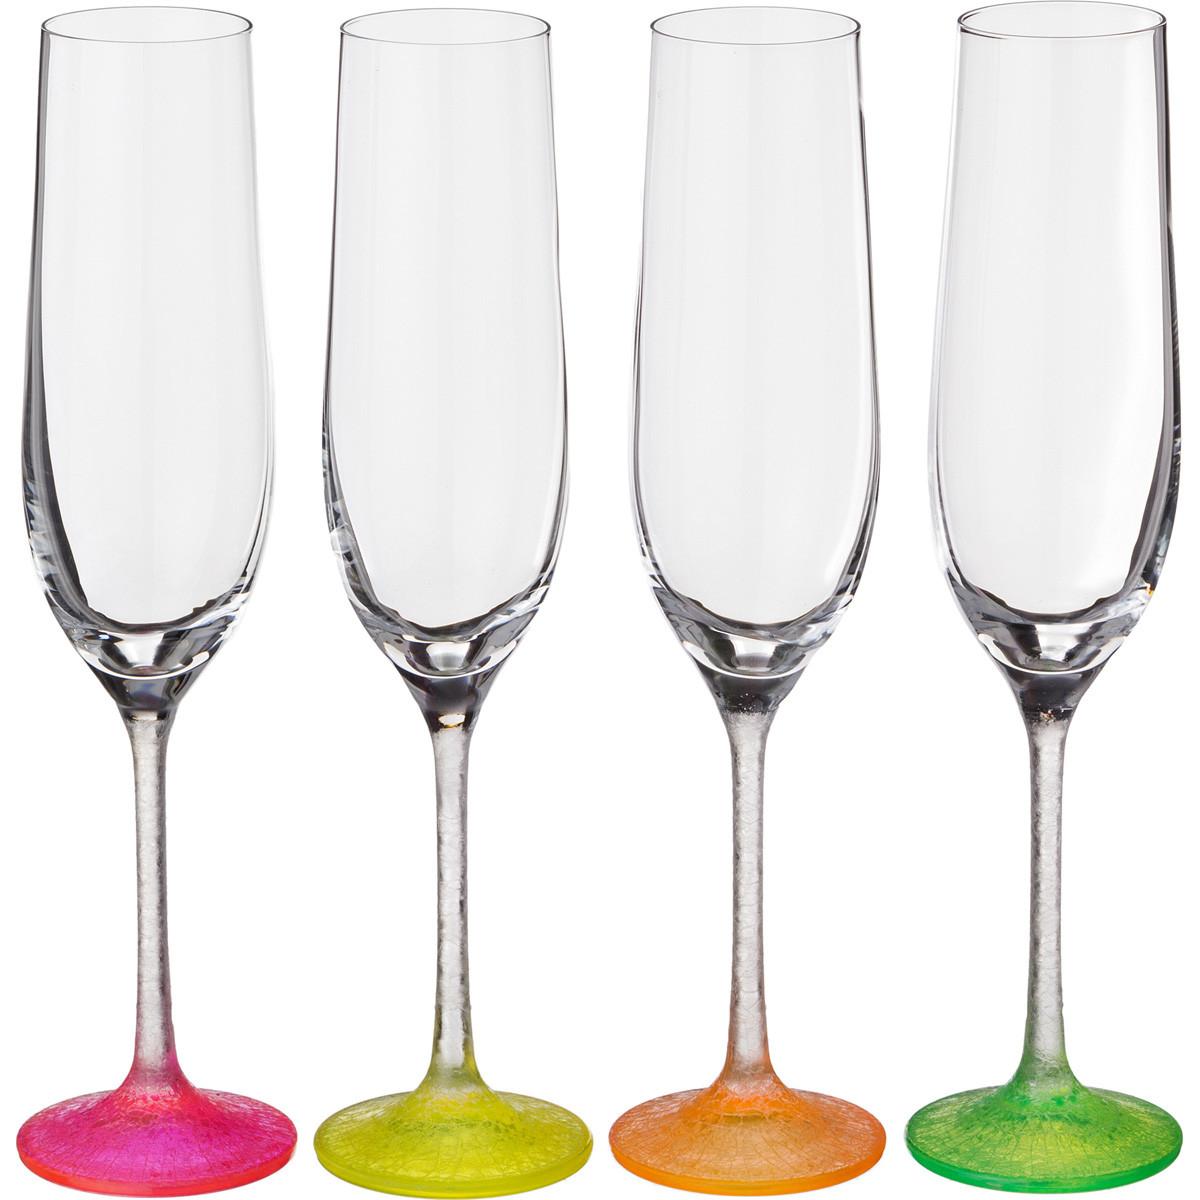 {} Bohemia Crystal Набор бокалов для шампанского Bambie (24 см - 4 шт) bohemia crystal набор бокалов для шампанского felina 25 см 2 шт